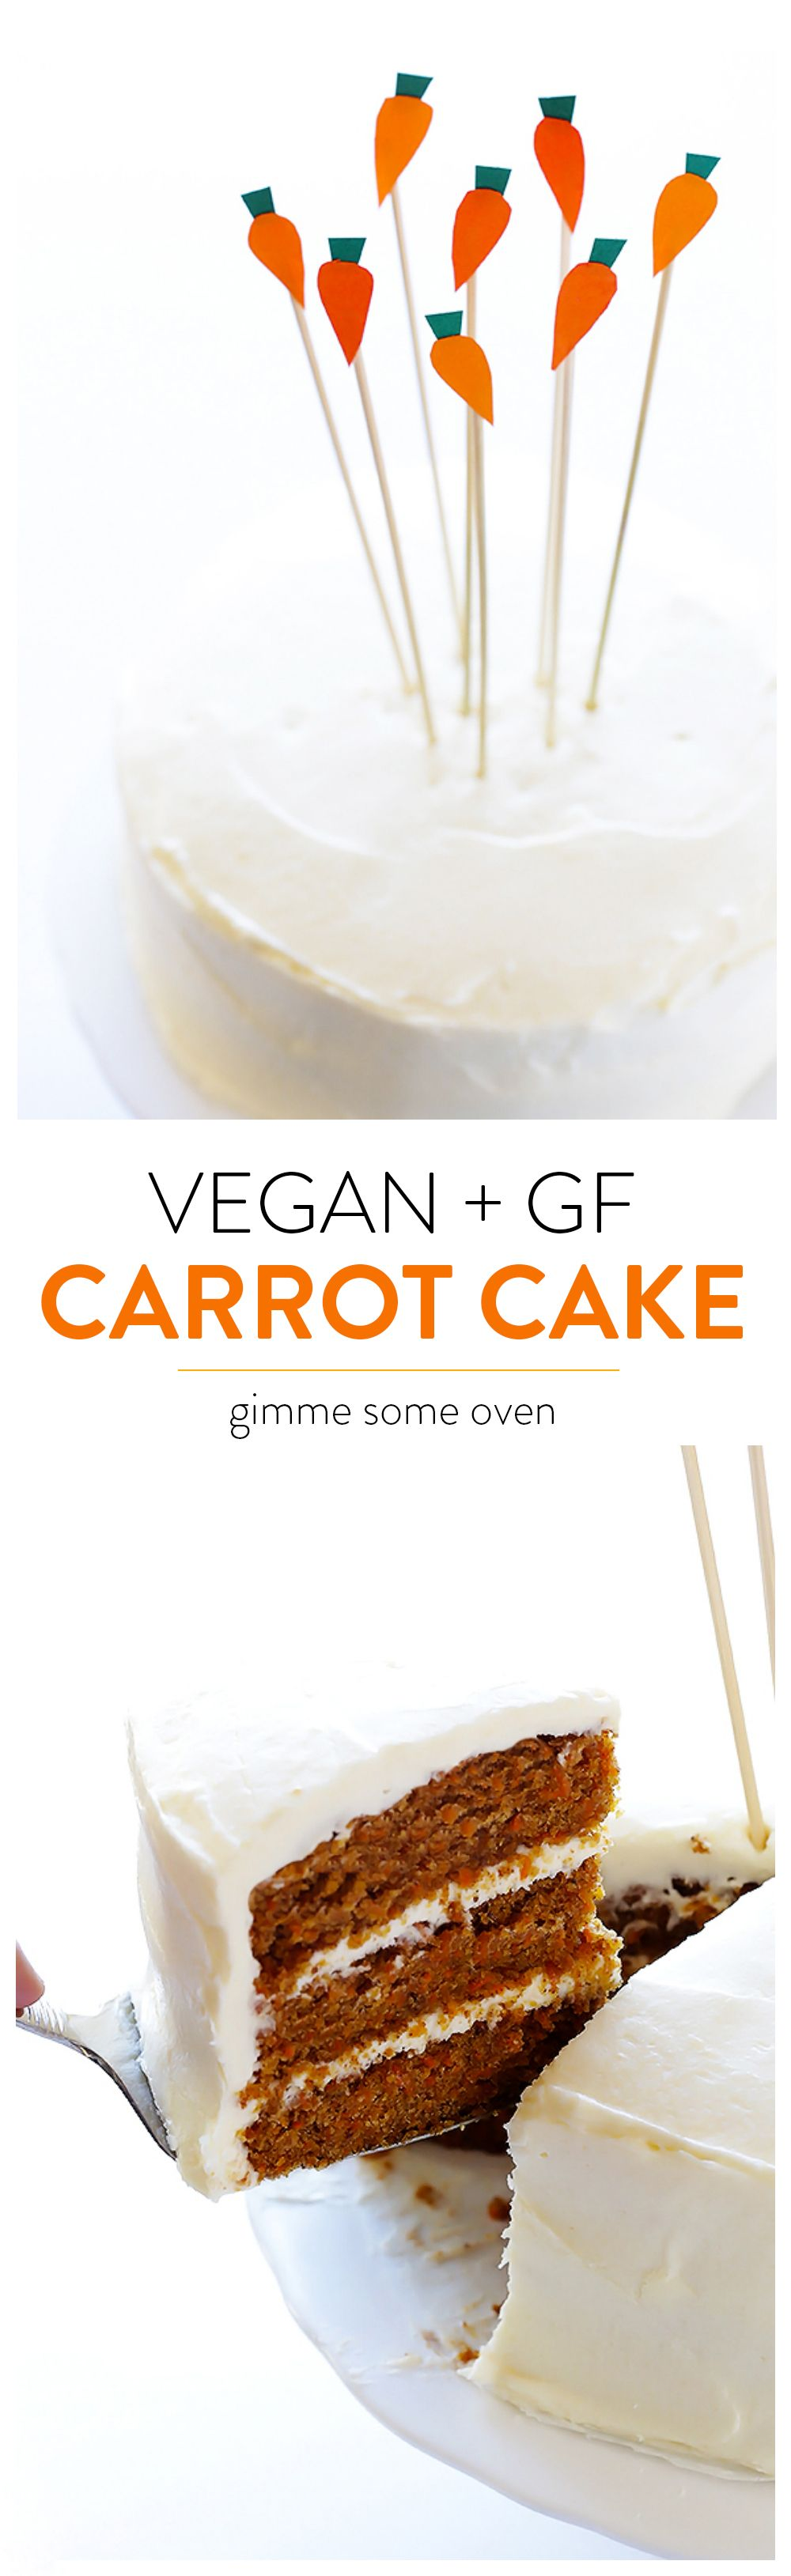 Vegan GlutenFree Carrot Cake Recipe Vegan desserts